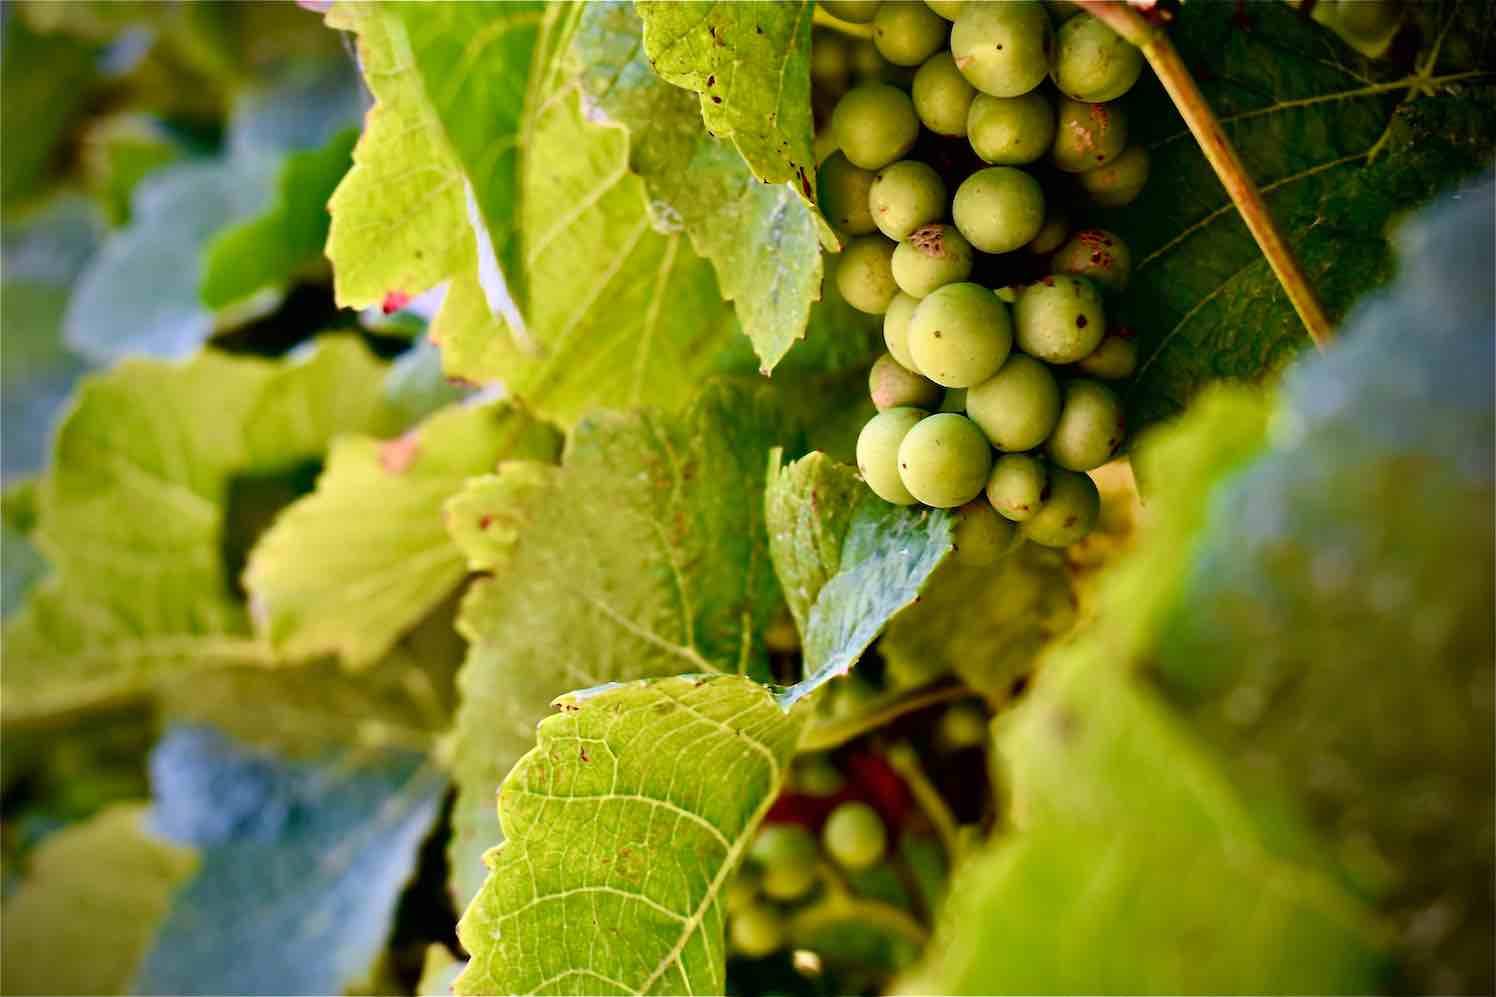 tuinieren-sireen-bisseling-druiven